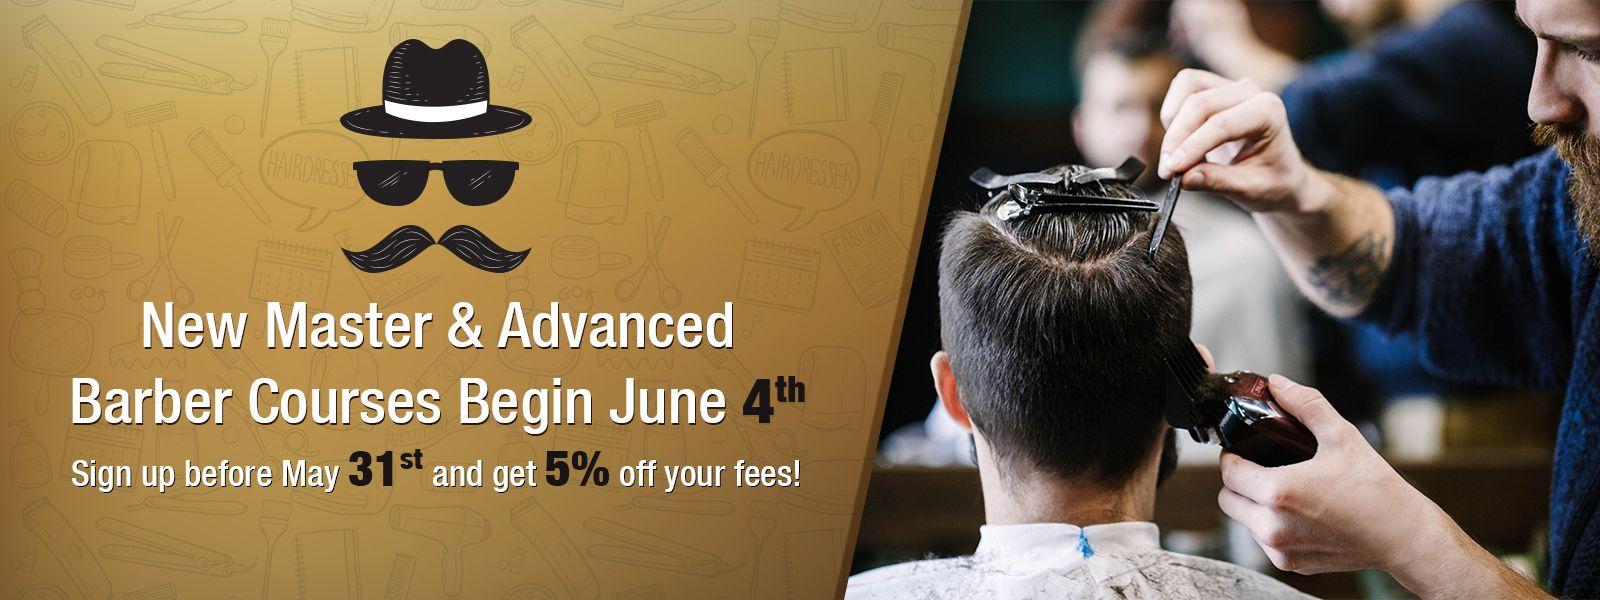 International Barber Institute can help you gain the